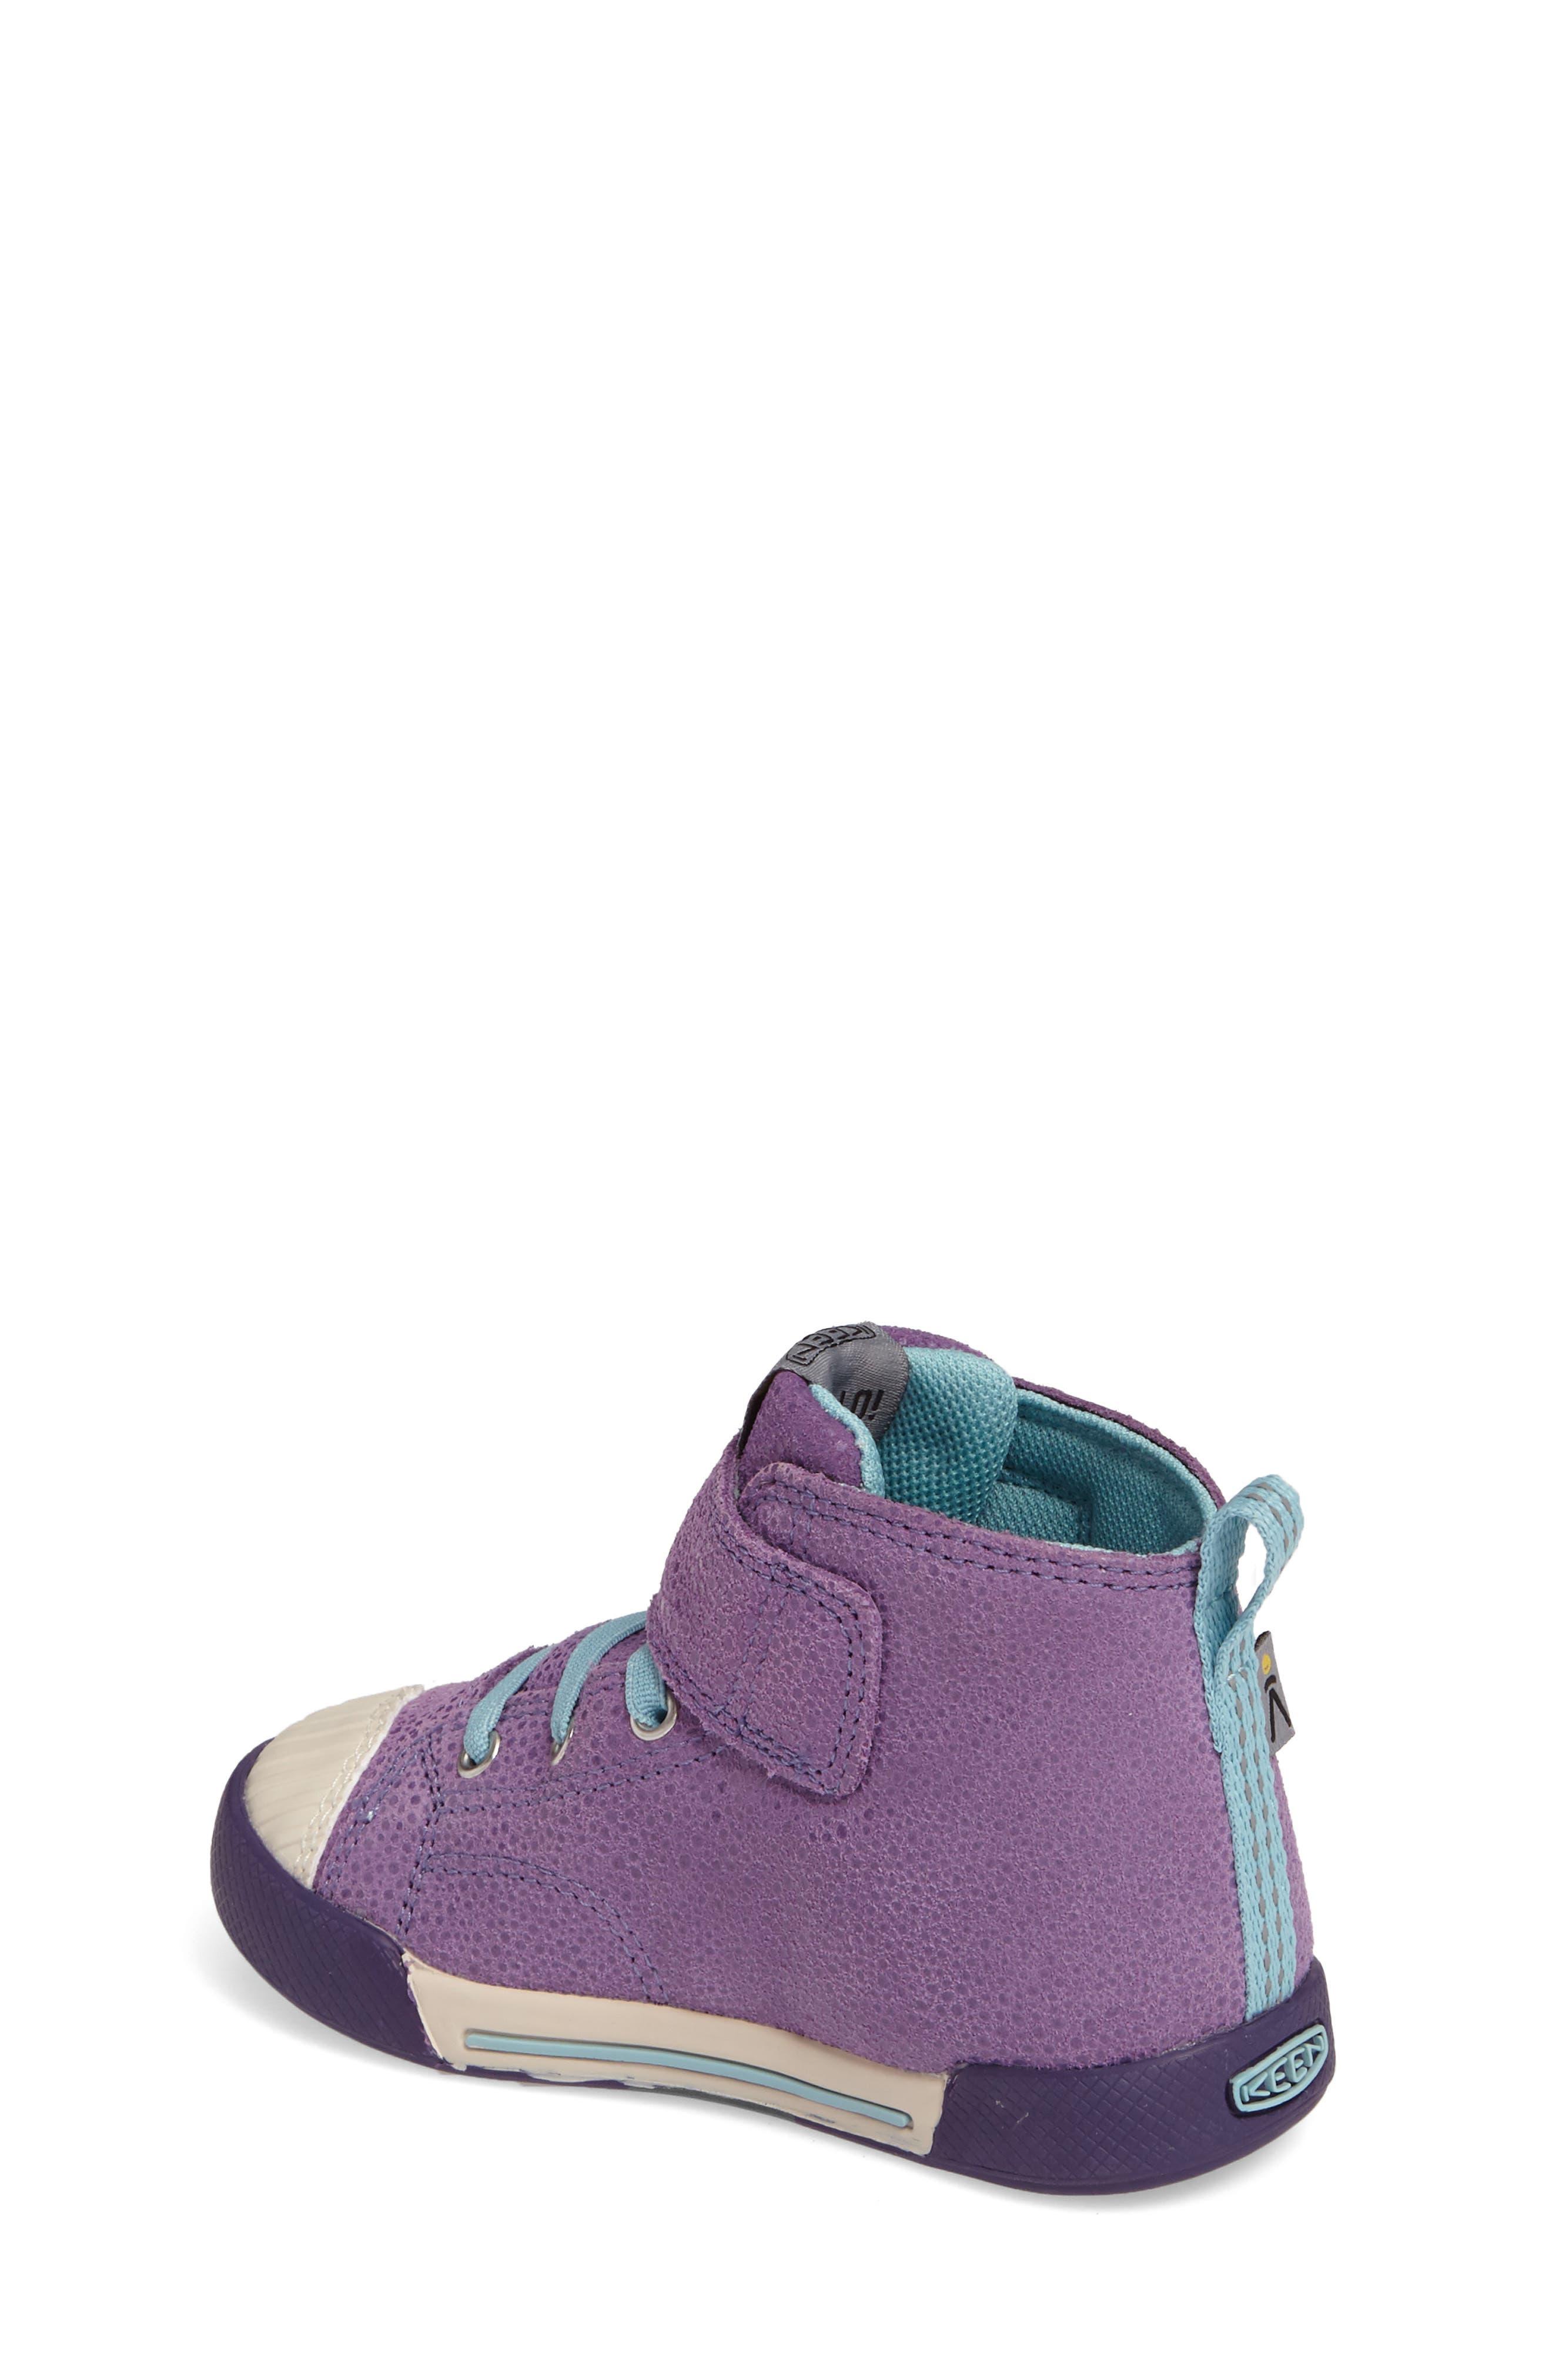 Alternate Image 2  - Keen 'Encanto Scout' High Top Sneaker (Baby, Walker, Toddler & Little Kid)